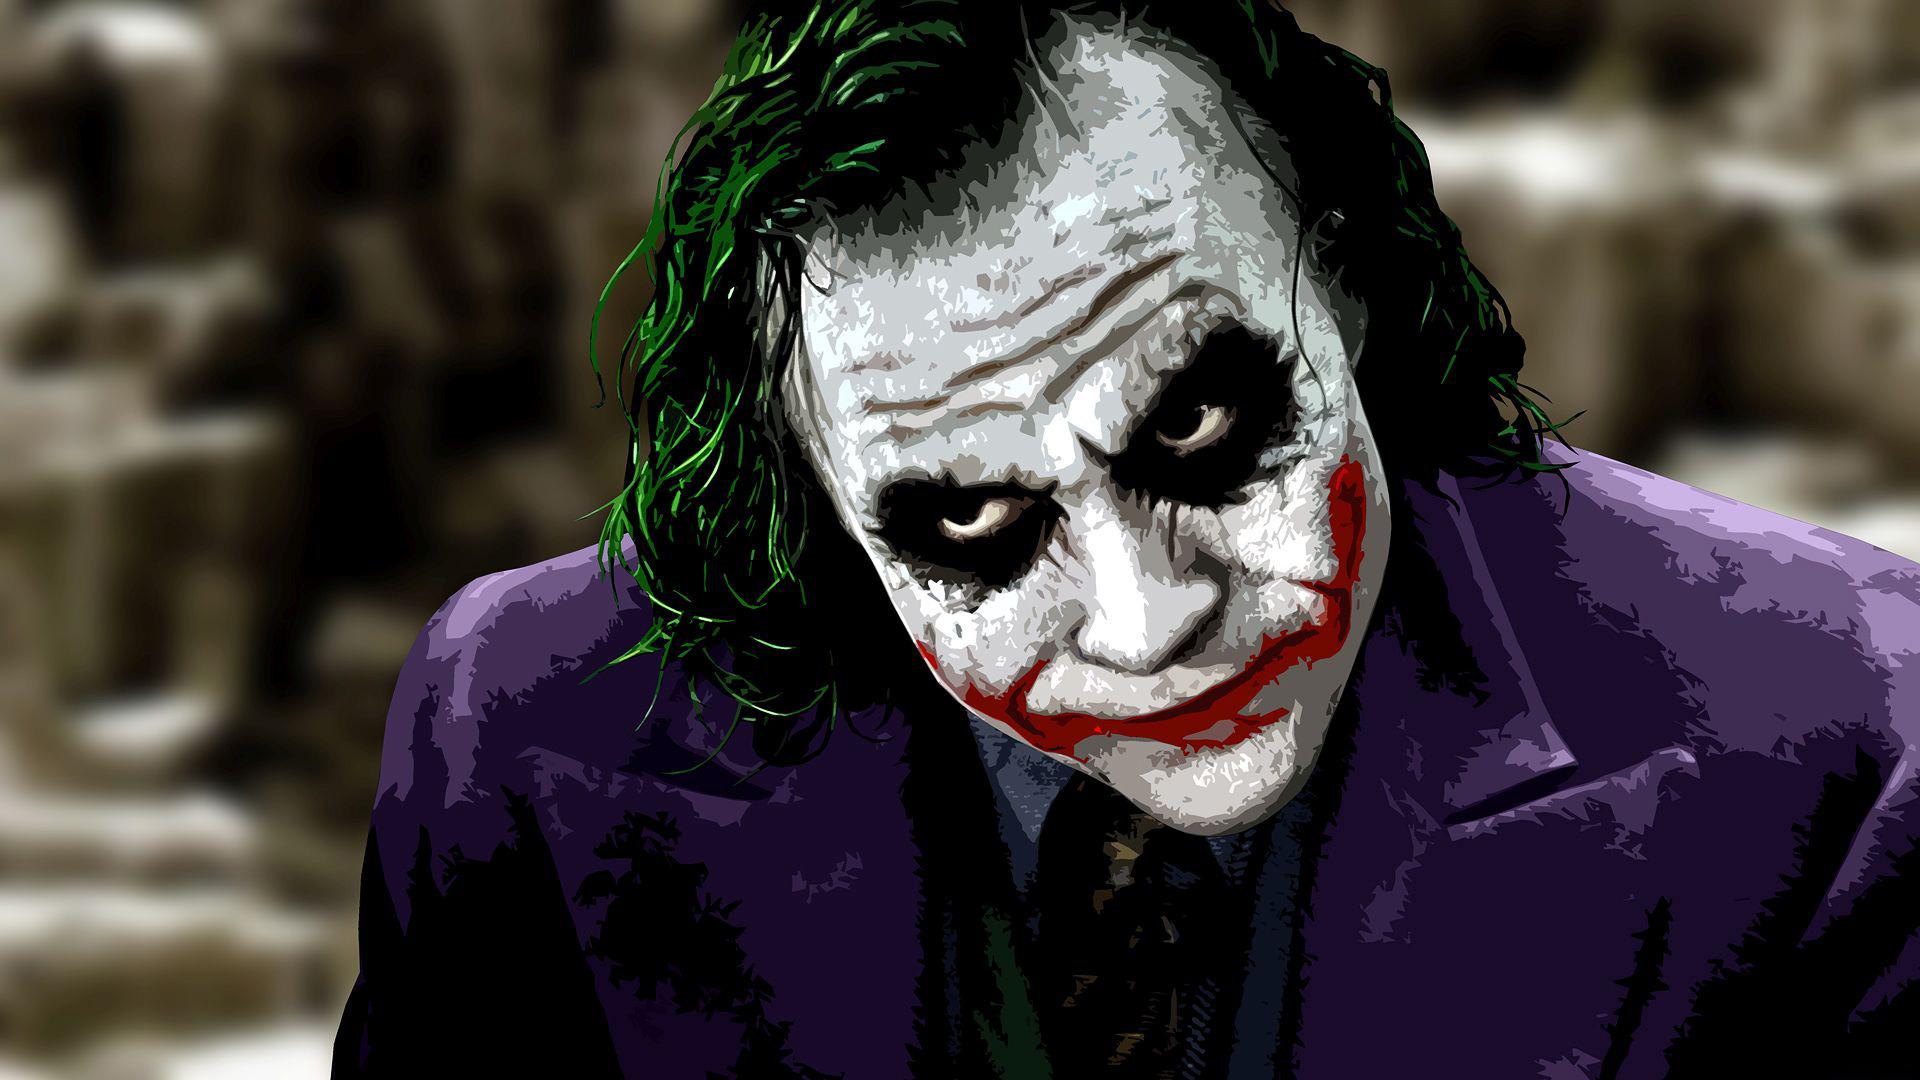 The Joker - The Dark Knight wallpaper - 1208189 Jared Leto